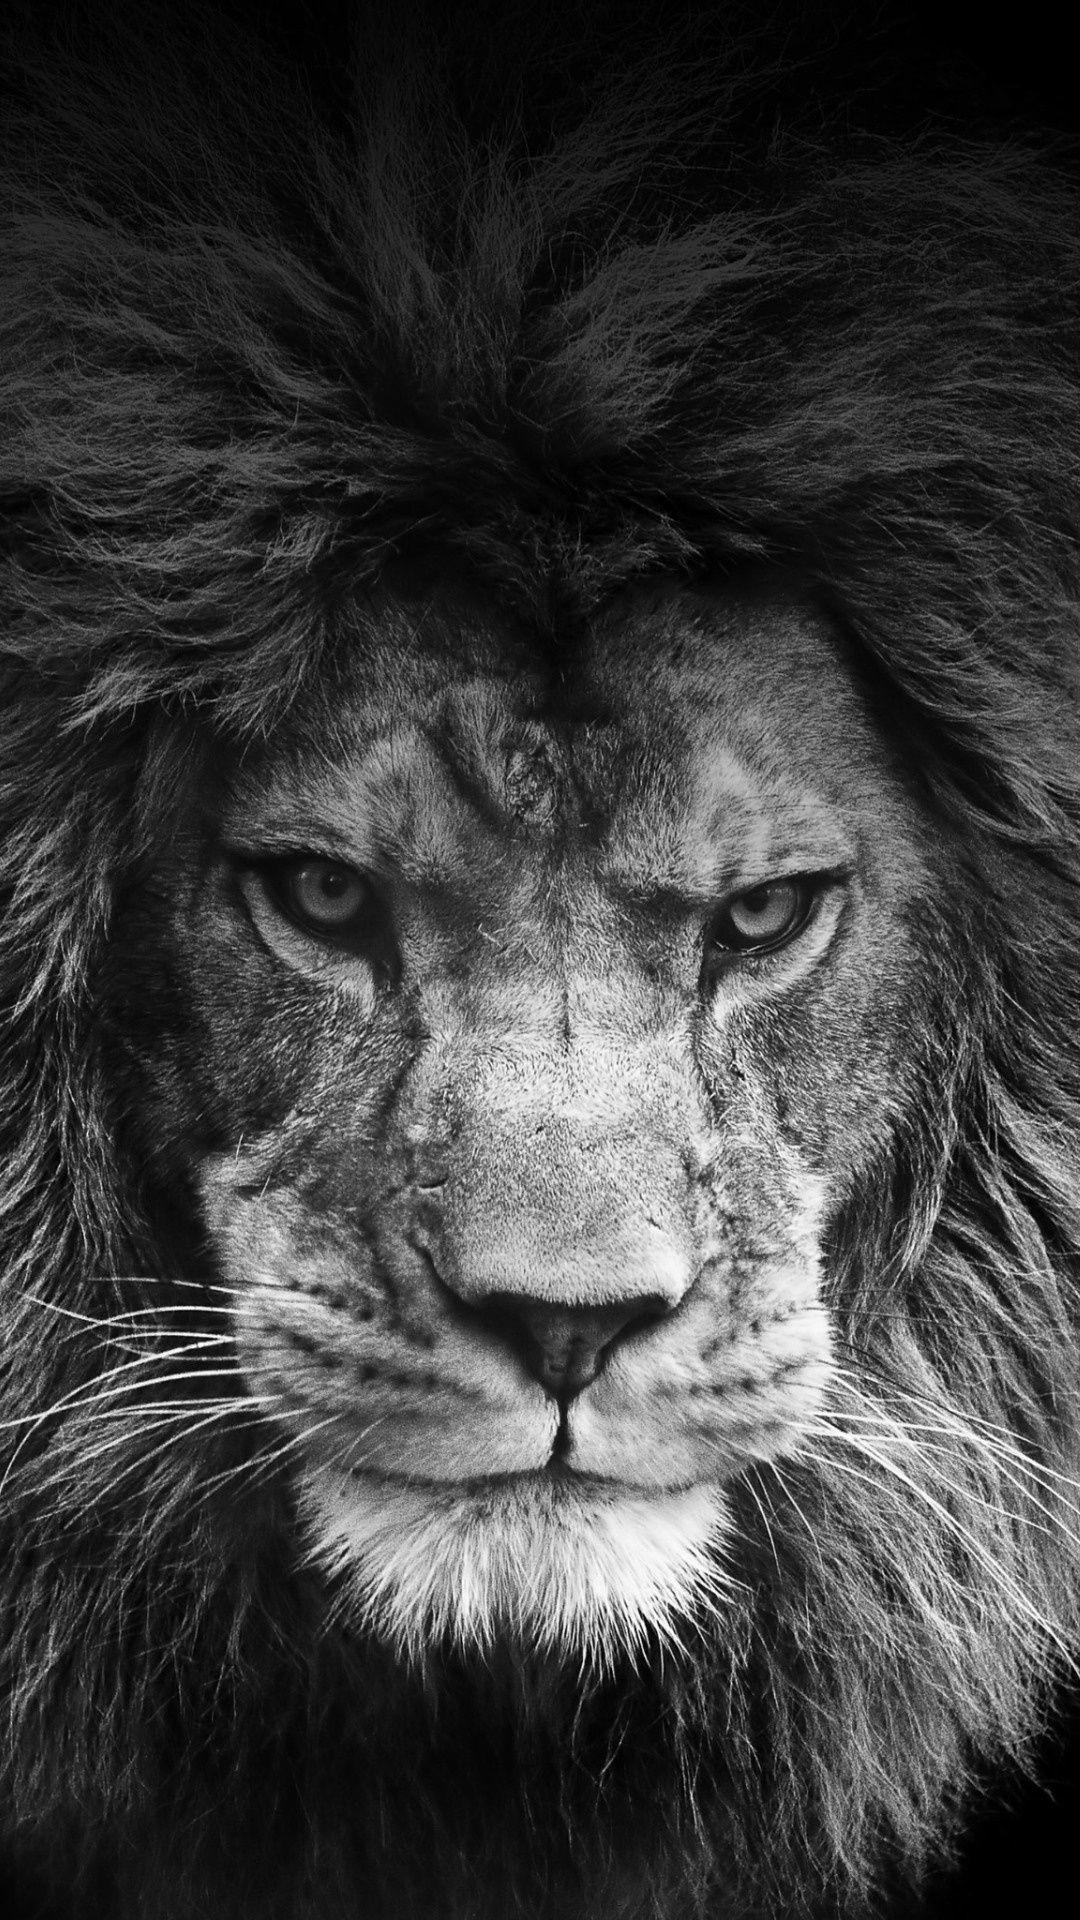 Res: 1080x1920, Find out: Legendary Lion wallpaper on http://hdpicorner.com/legendary-lion/